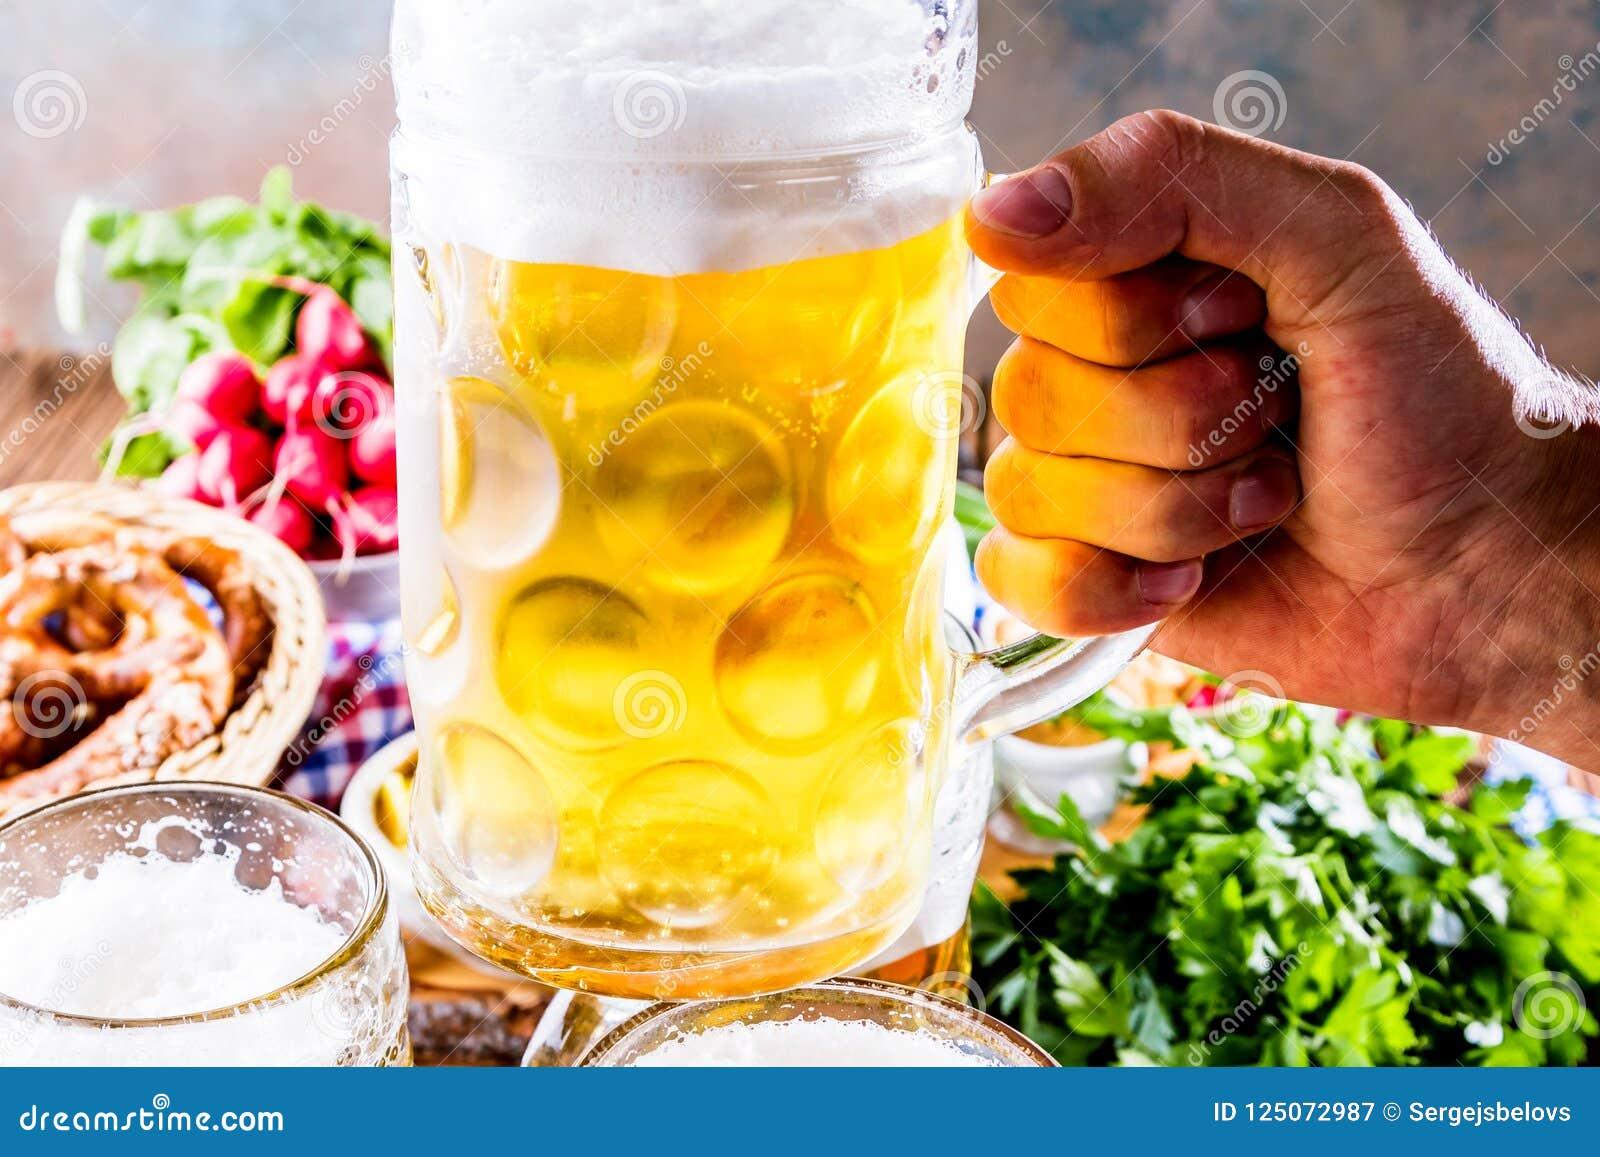 Menu dell alimento di Oktoberfest, salsiccie bavaresi con le ciambelline salate, purè di patate, crauti, birra